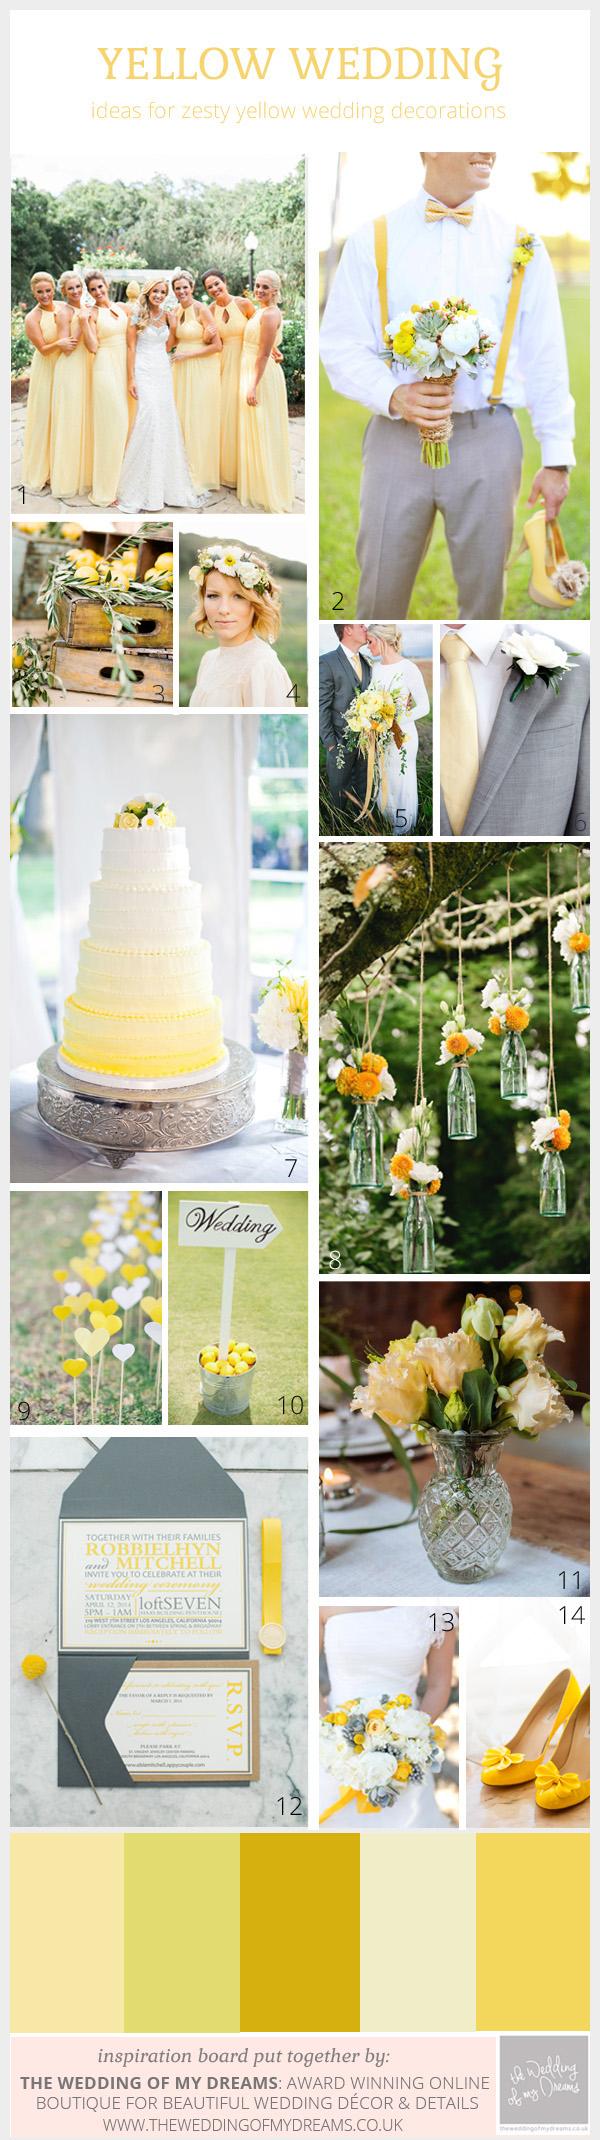 Yellow Wedding Decorations Spring Weddings Zesty Lemon Yellow Wedding Inspiration